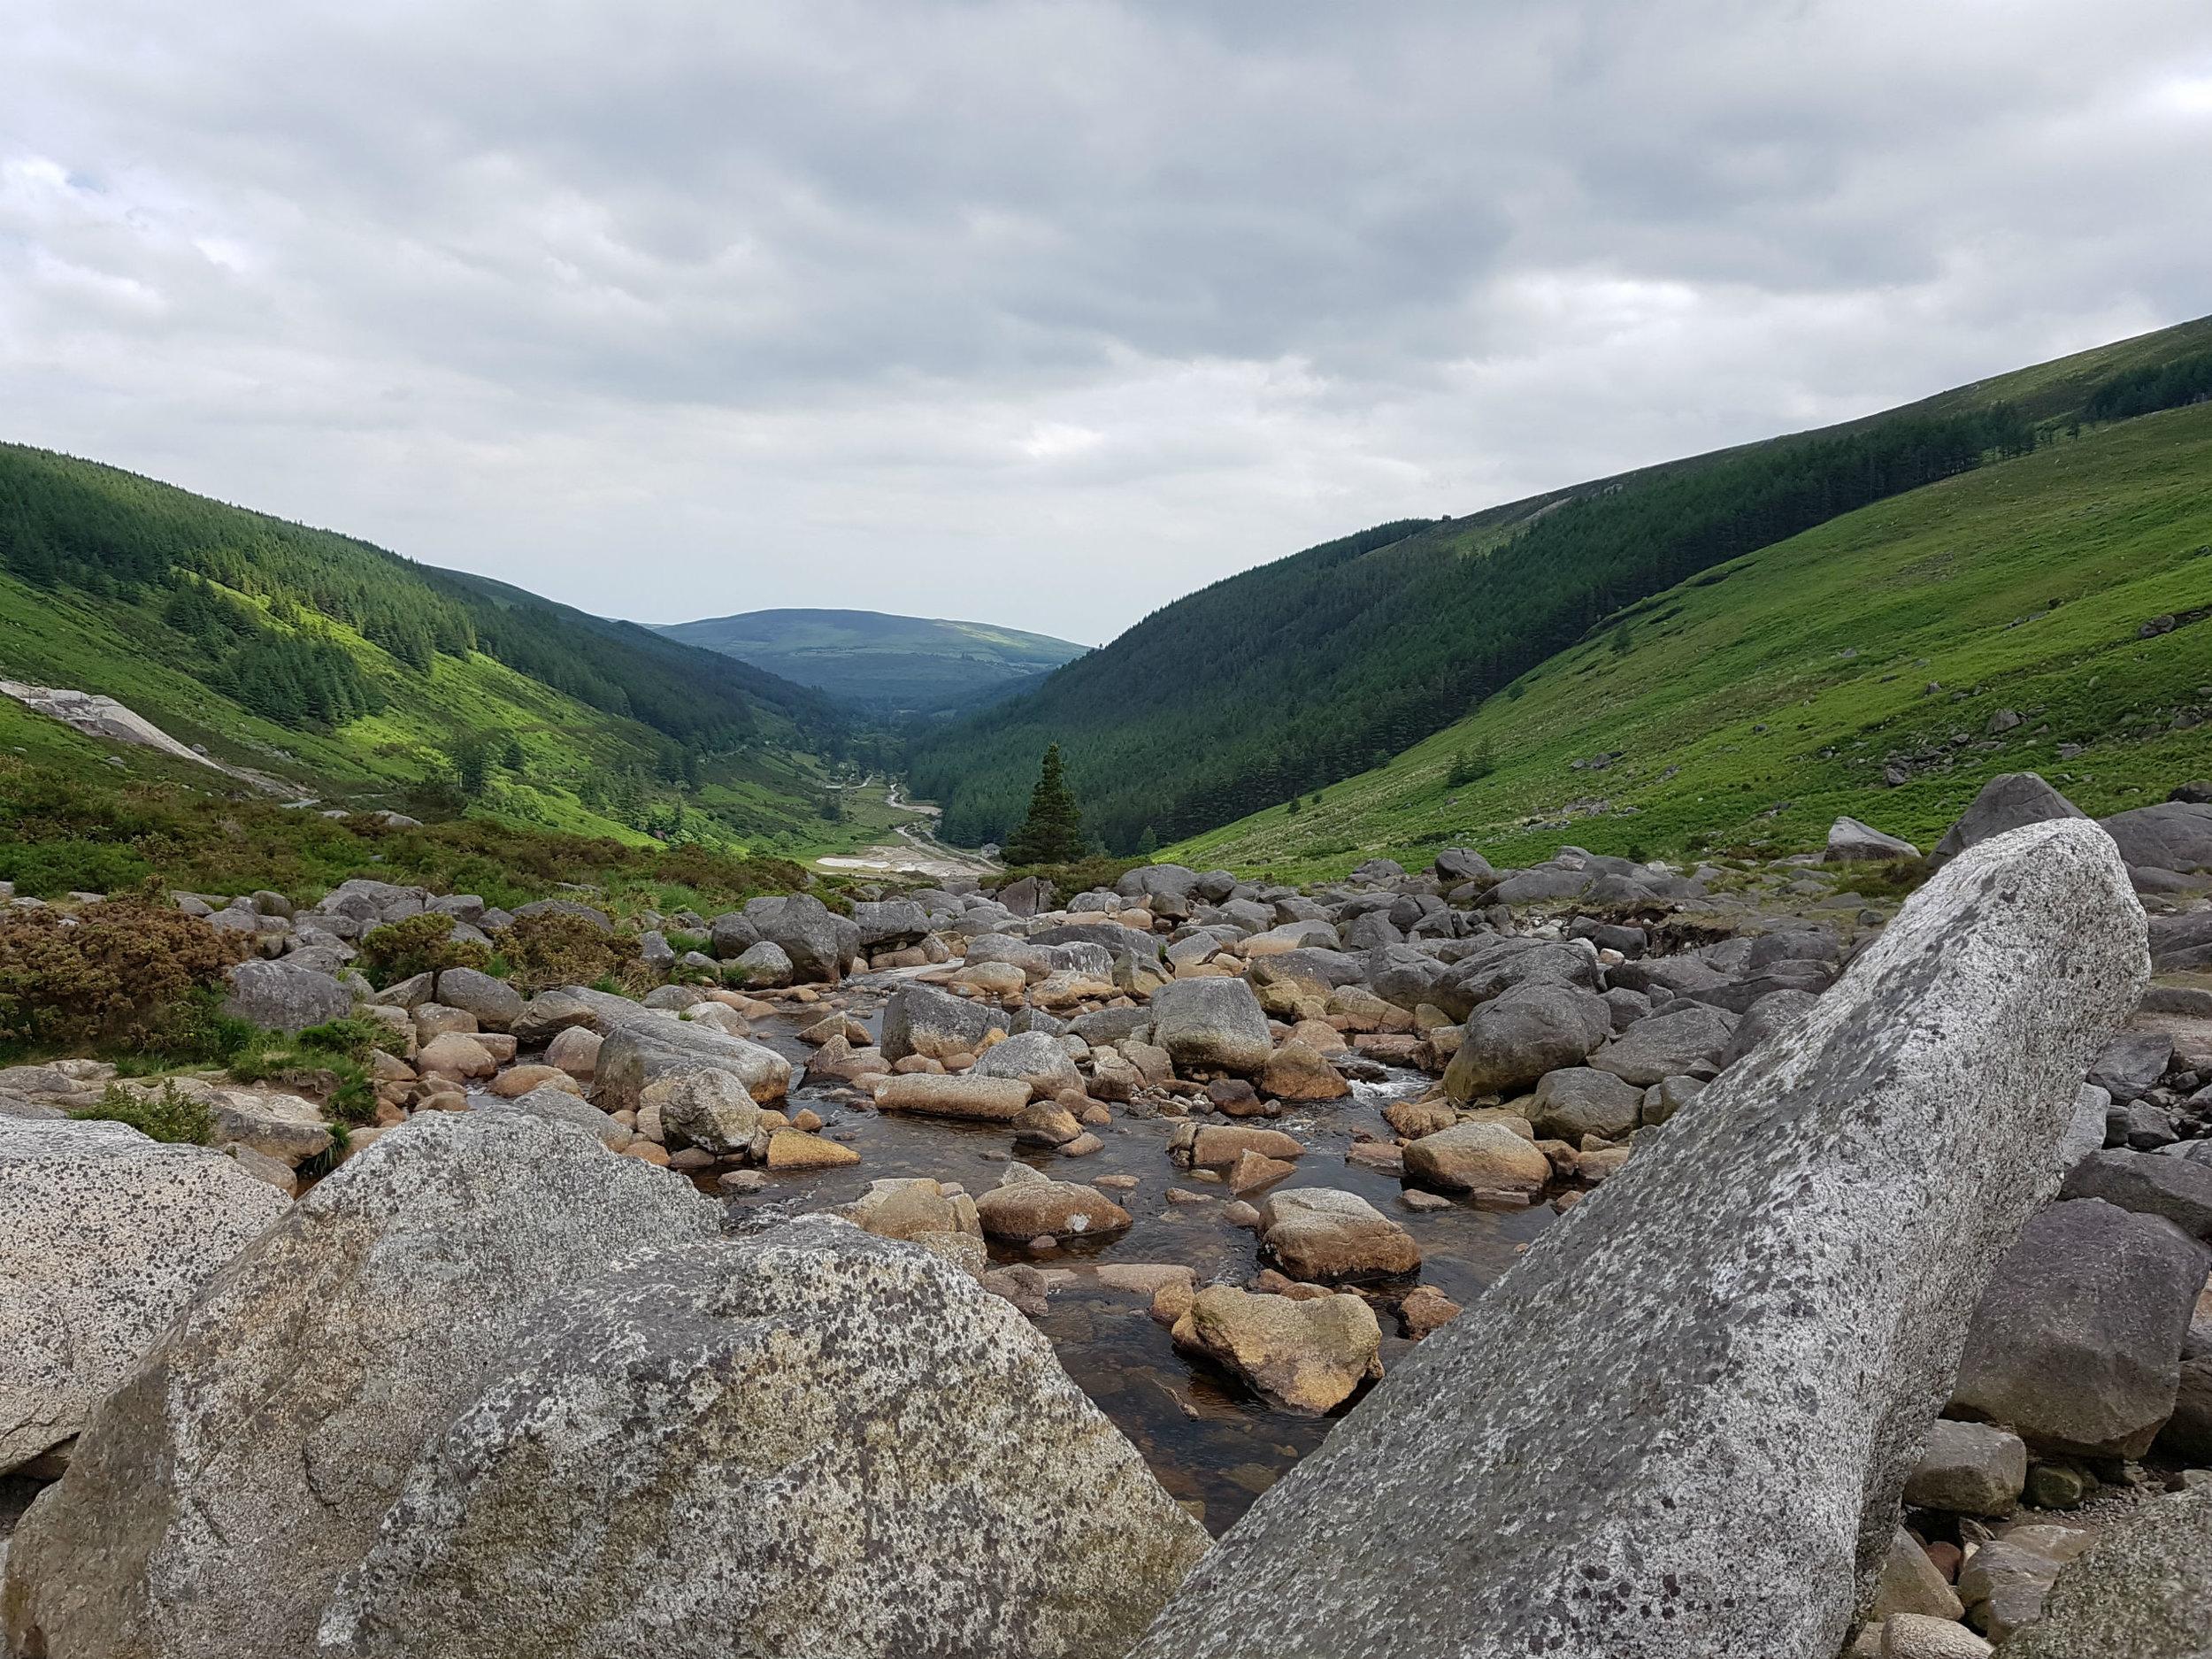 Valley at Glendalough